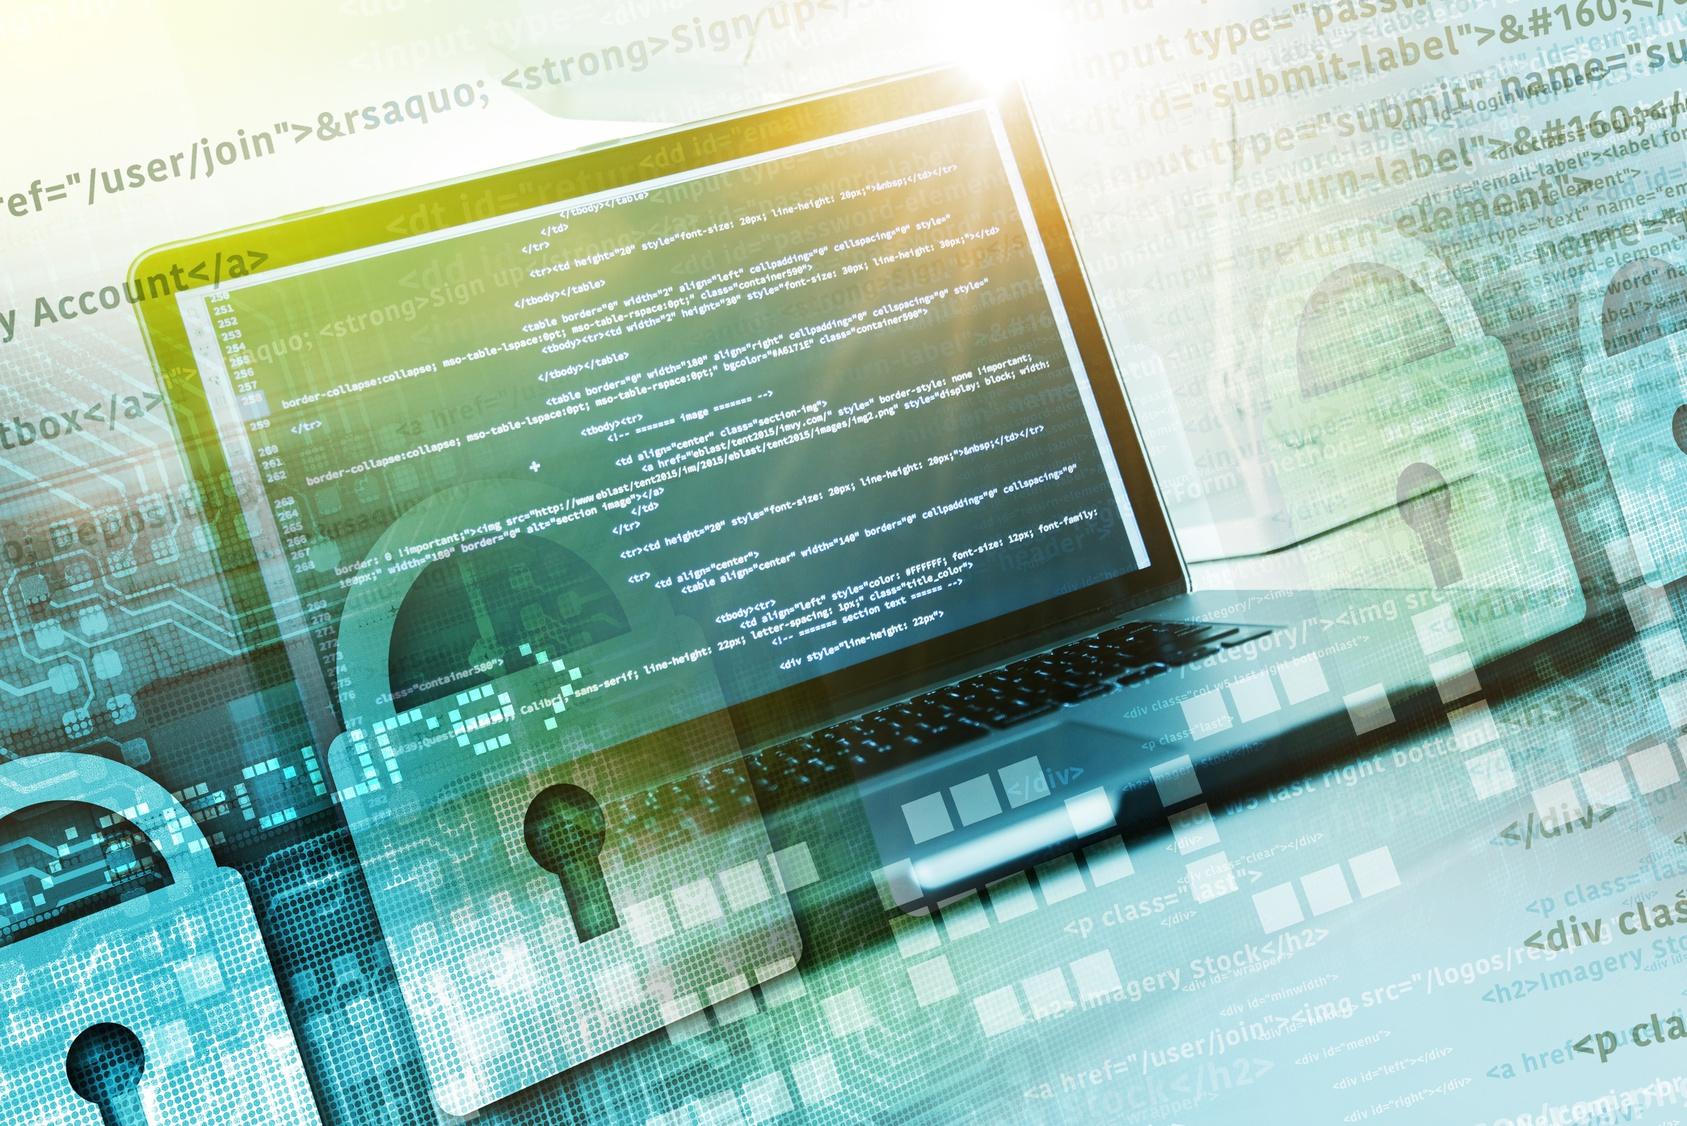 INES-SIRT(アイネス・サート)立ち上げ! 自社のセキュリティ基盤強化とお客様のセキュリティ対策支援のエンジンに